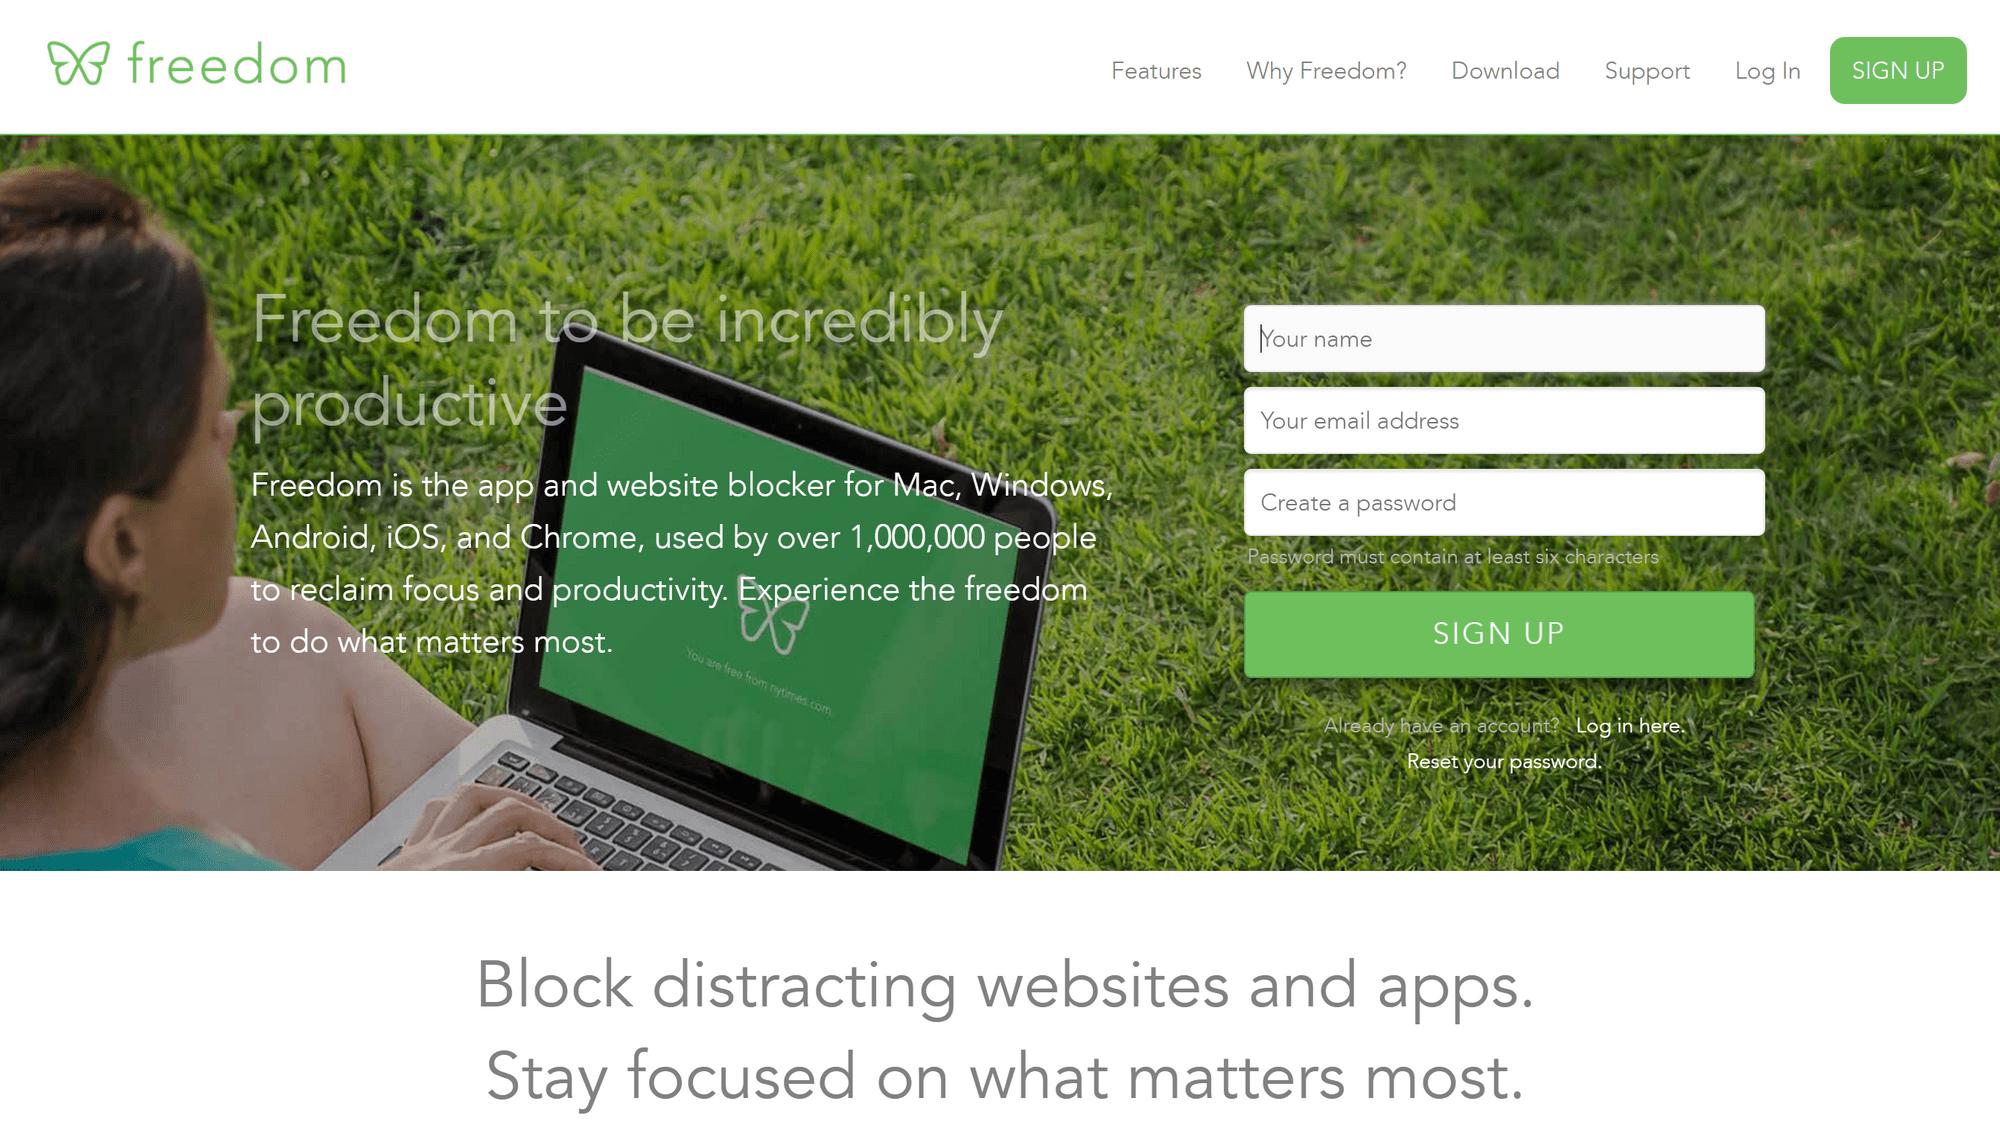 Freedom App's homepage